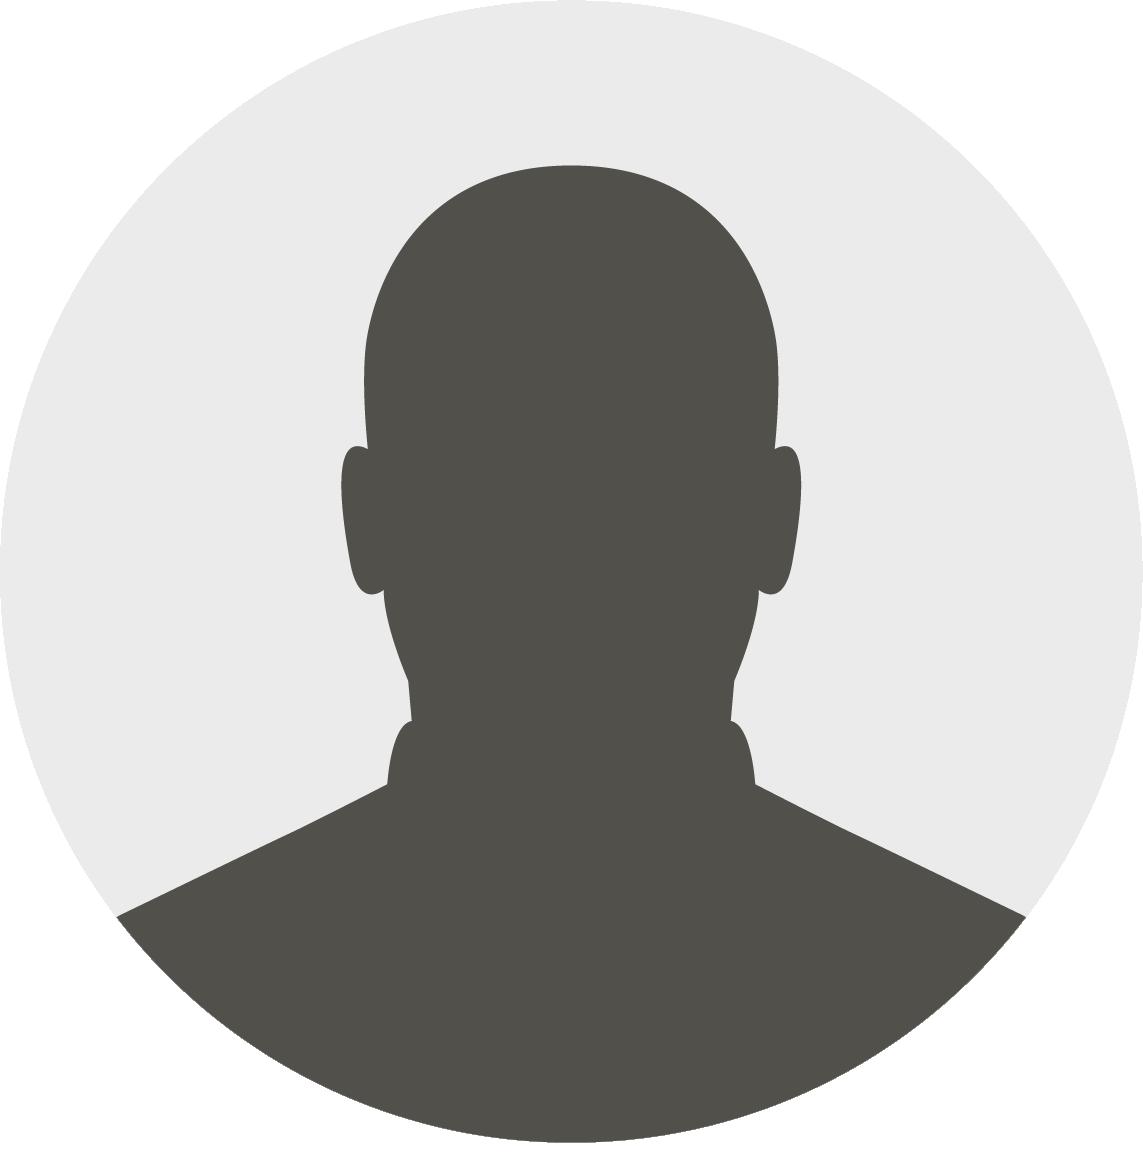 Emmanuel Kemakolam